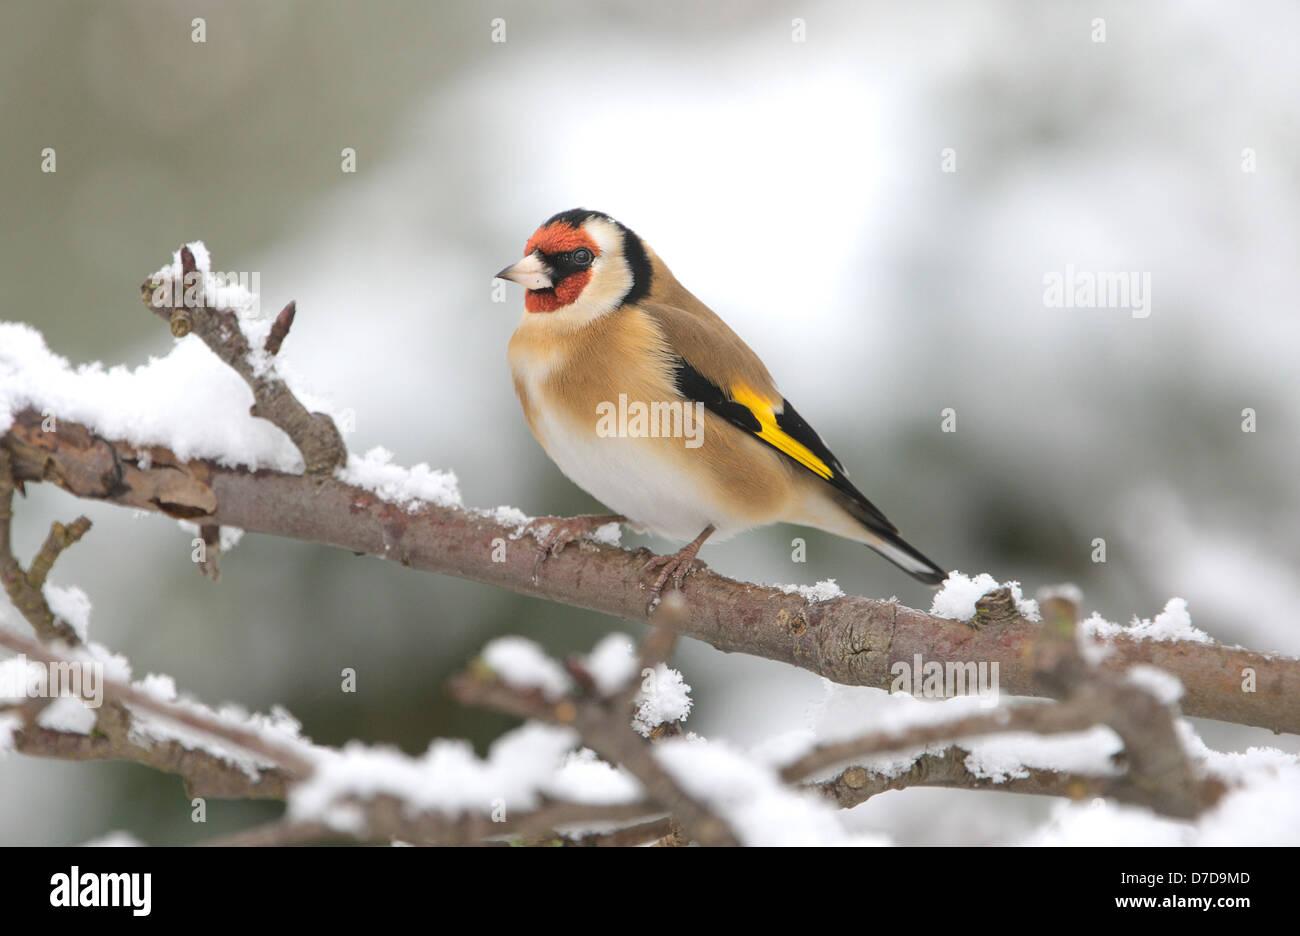 Goldfinch Carduelis carduelis - Stock Image